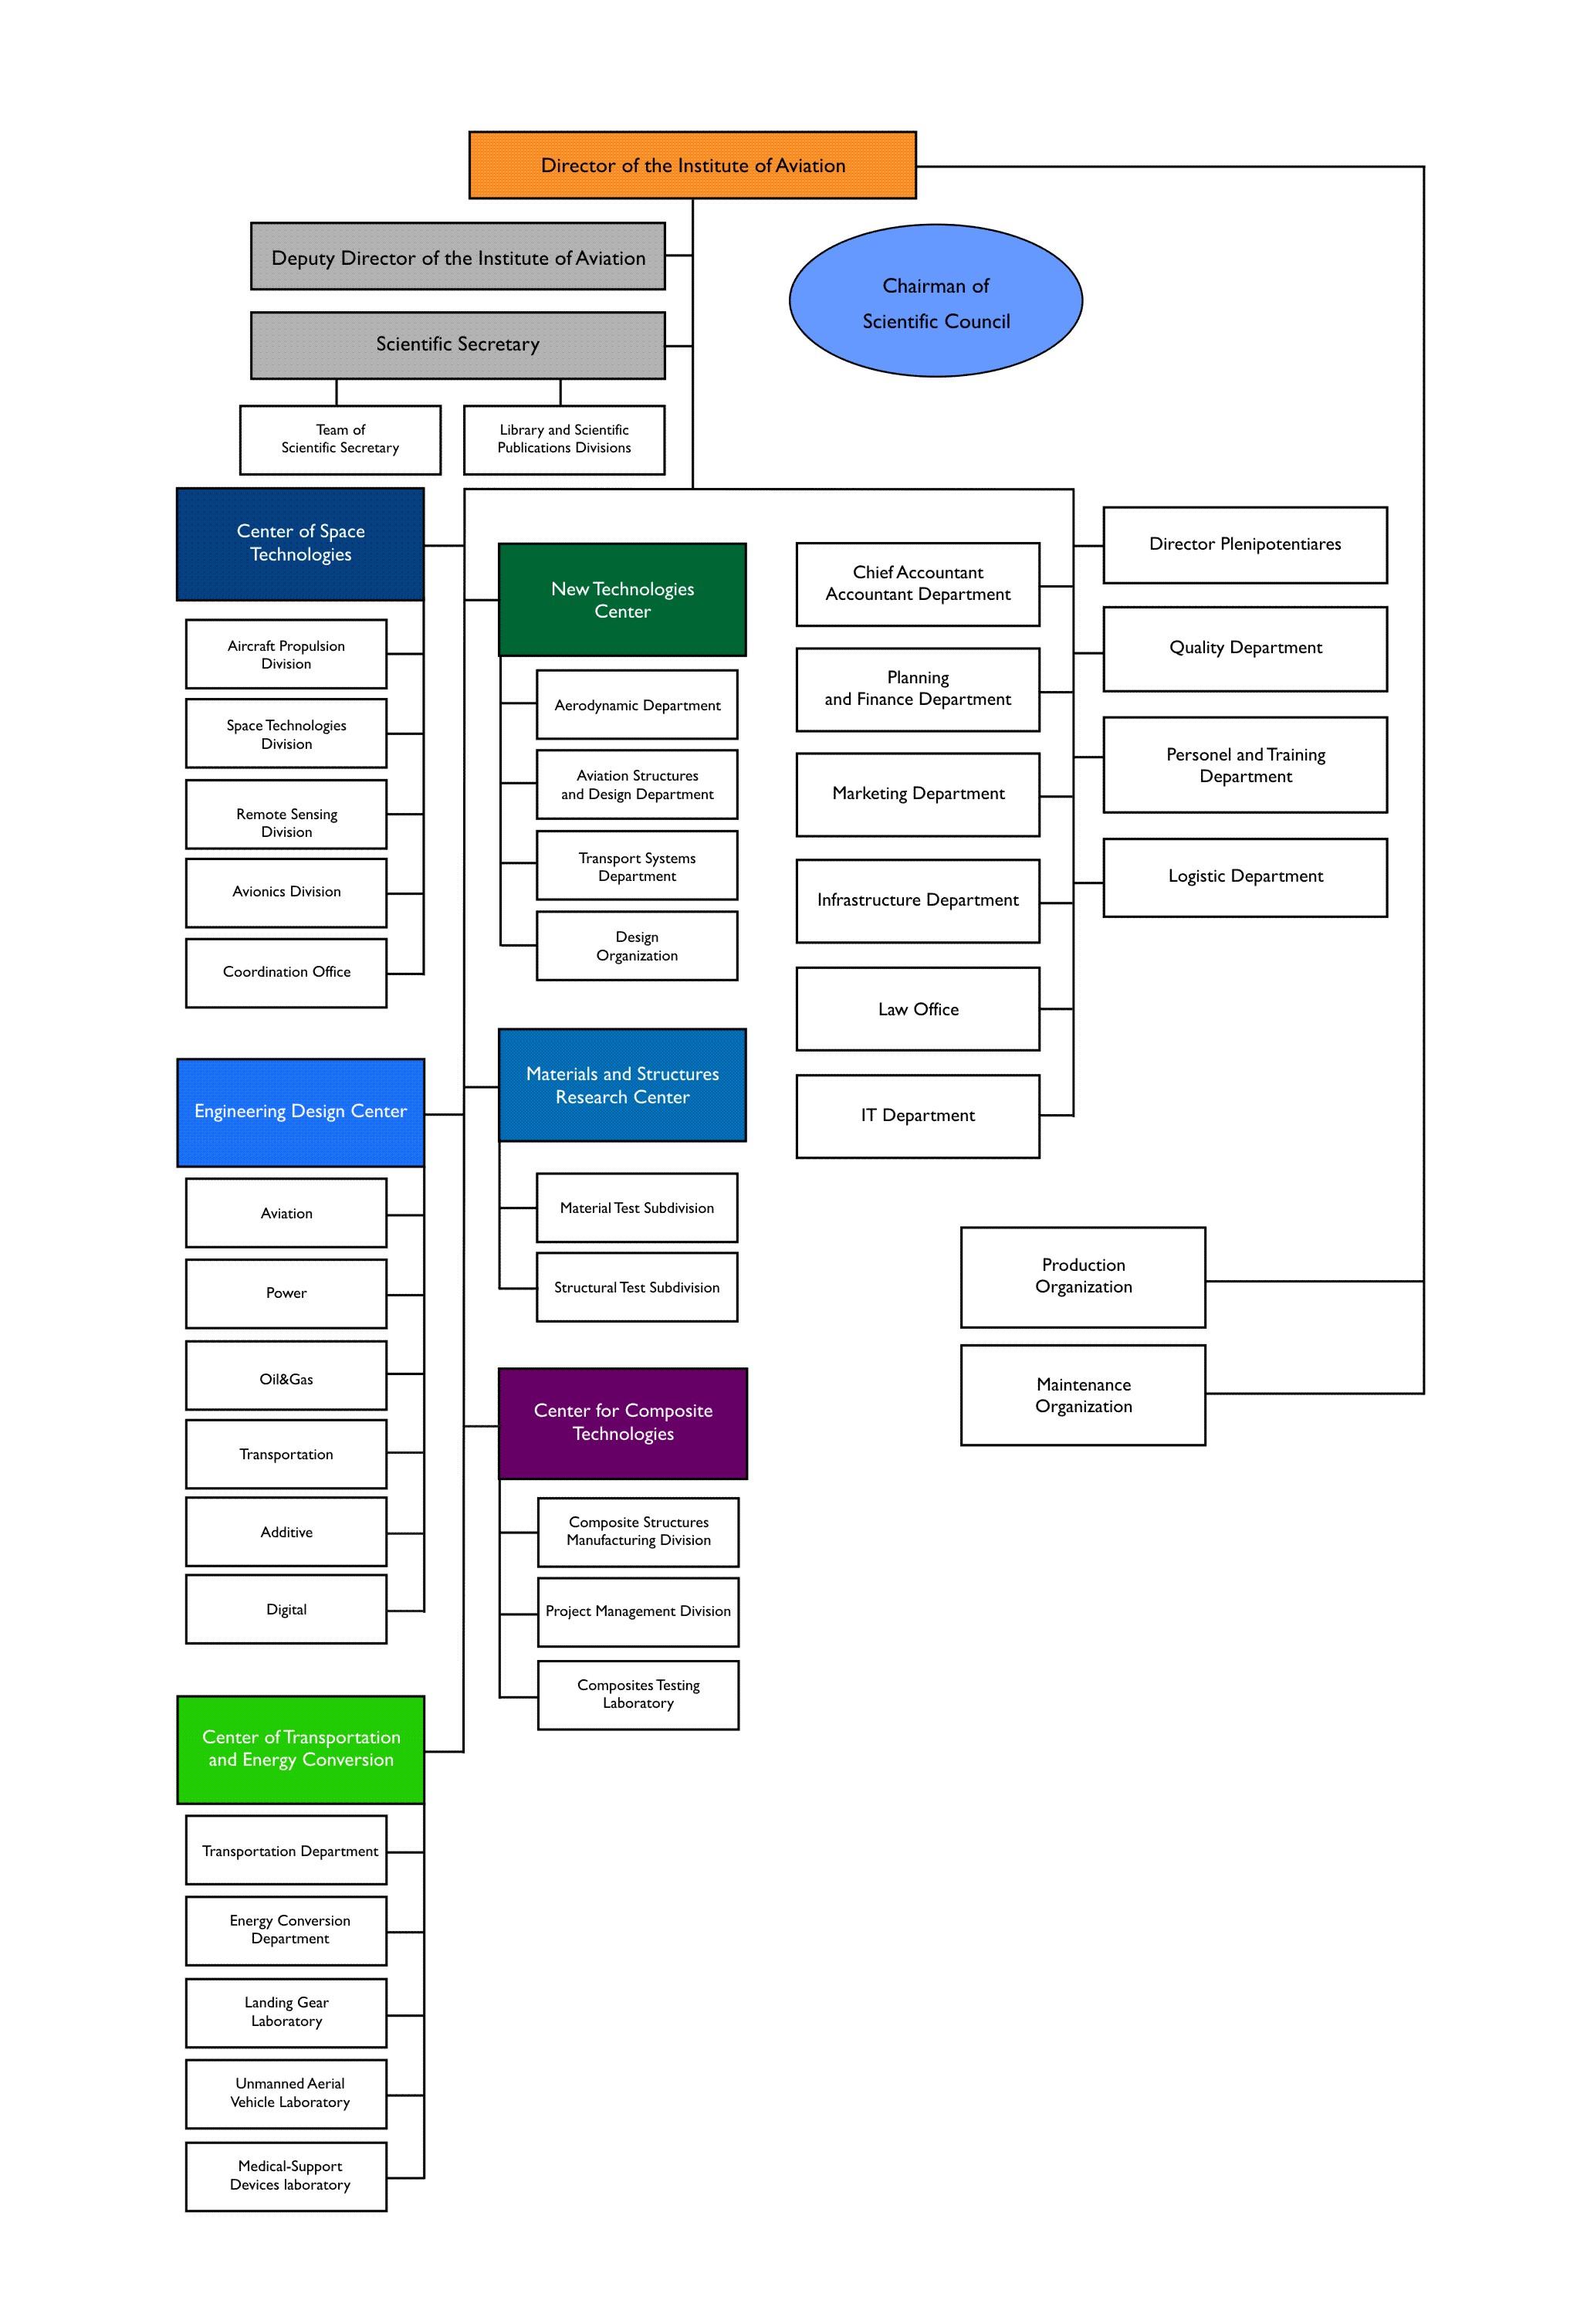 Instiute organizational structure - May 2017